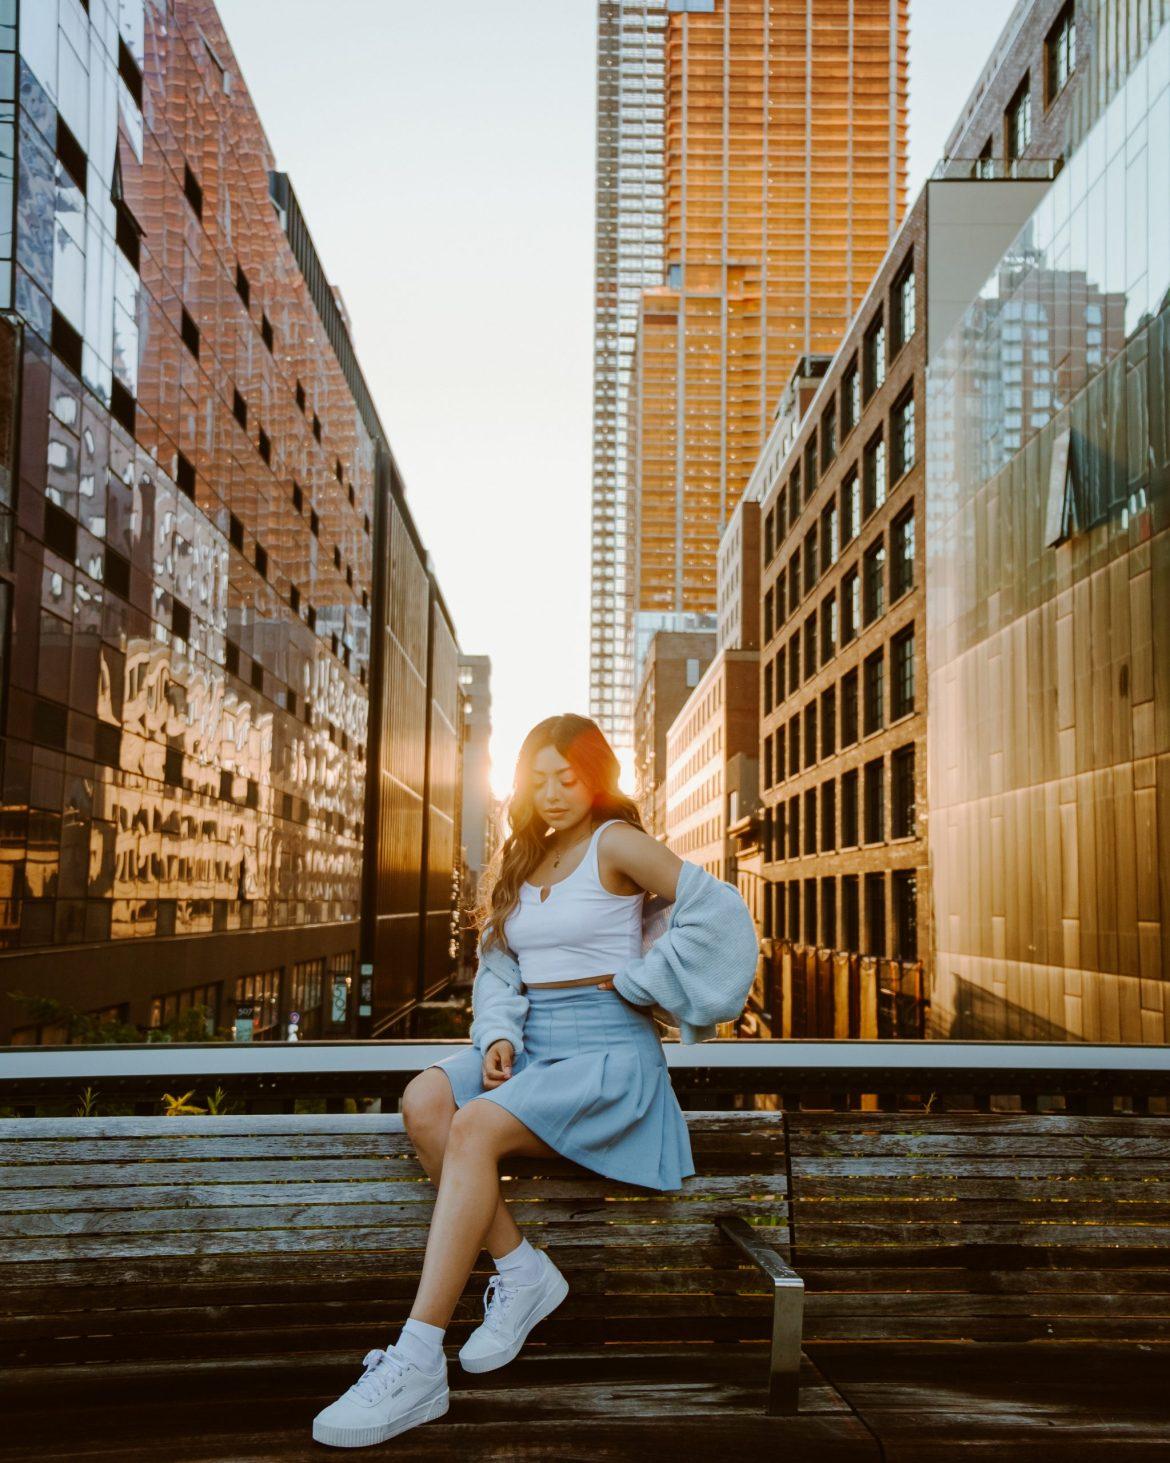 New York photo ideas